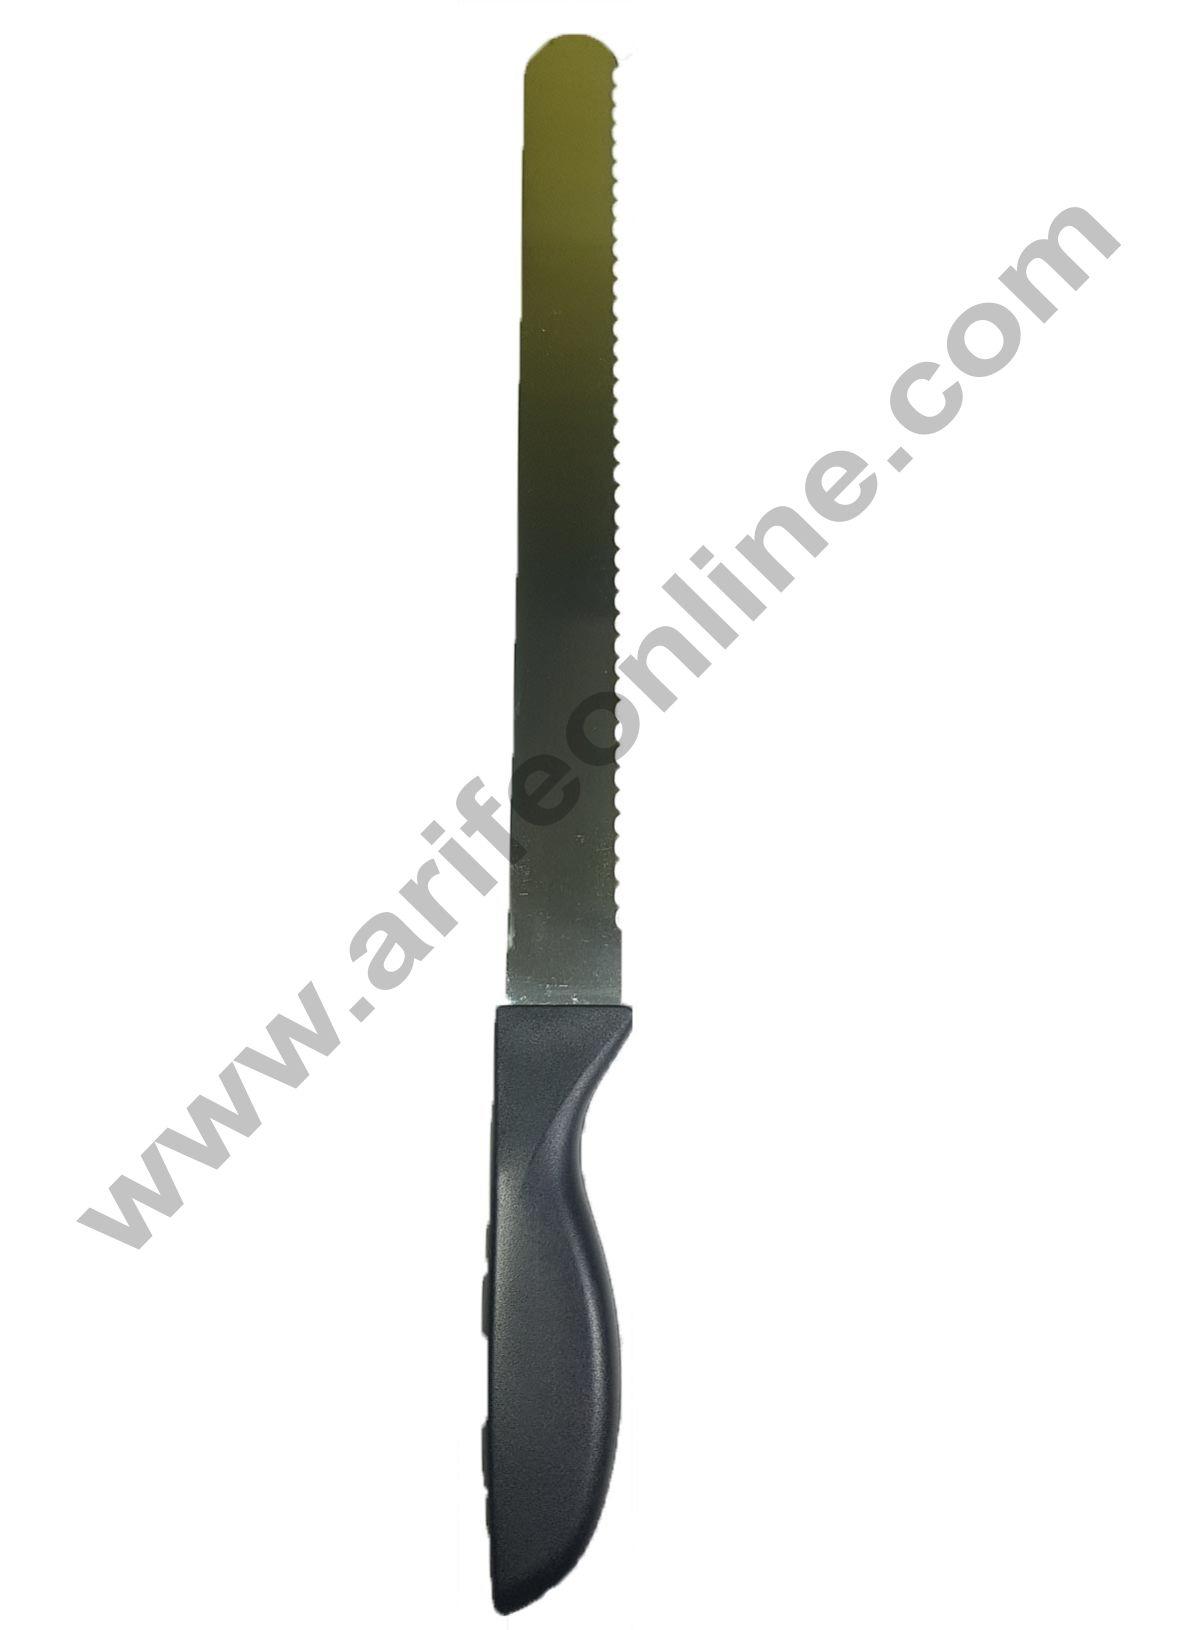 Cake Decor Straight Spatula Sawtooth Shape Knife,Combo Cake Pallate Knife-10inch/1pieces